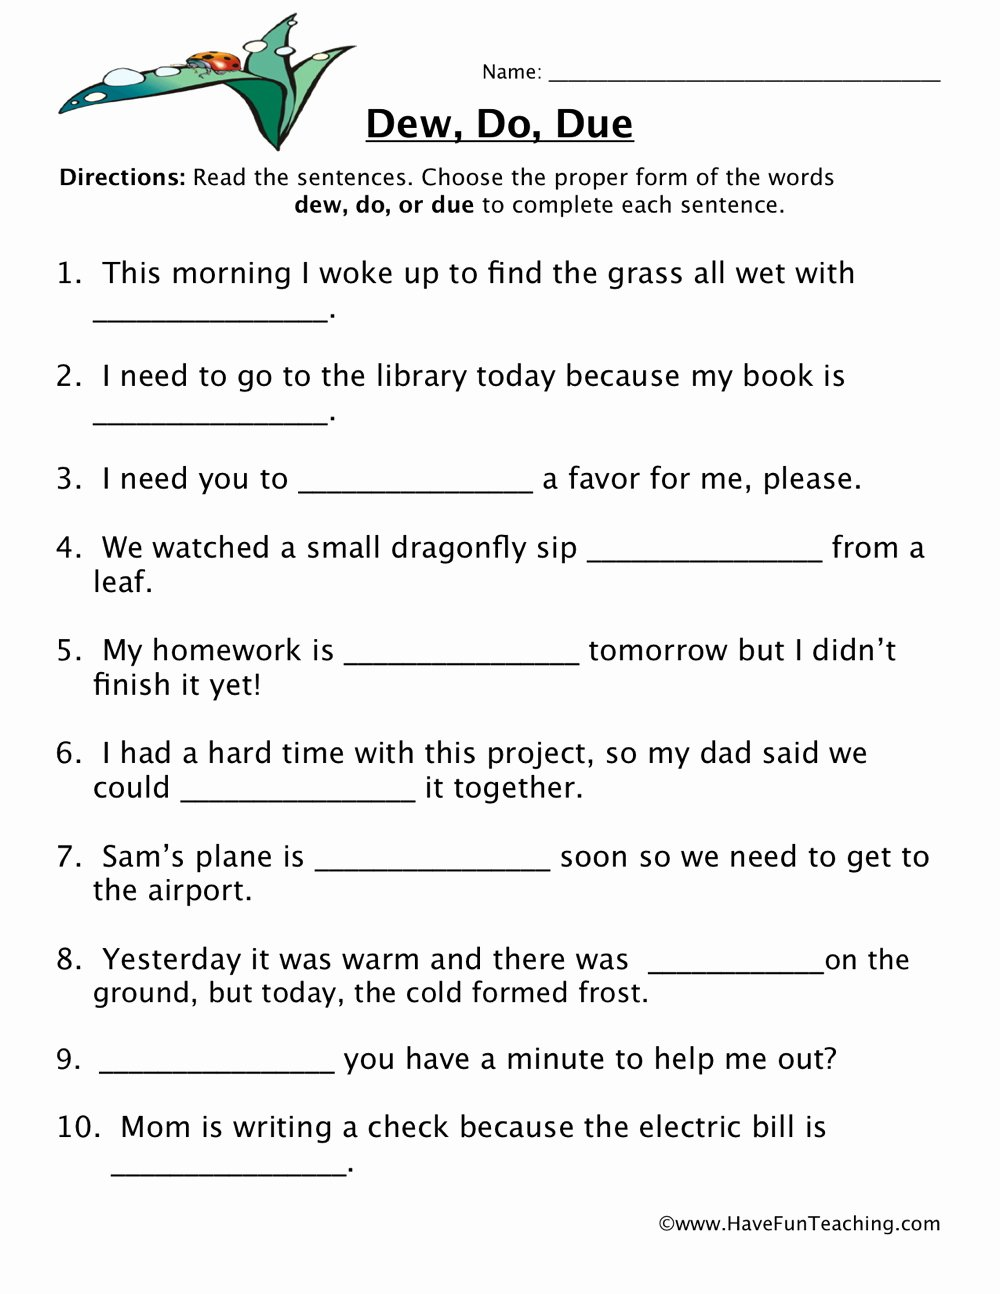 Homophones Worksheets for Grade 5 Best Of Dew Do Due Homophones Worksheet